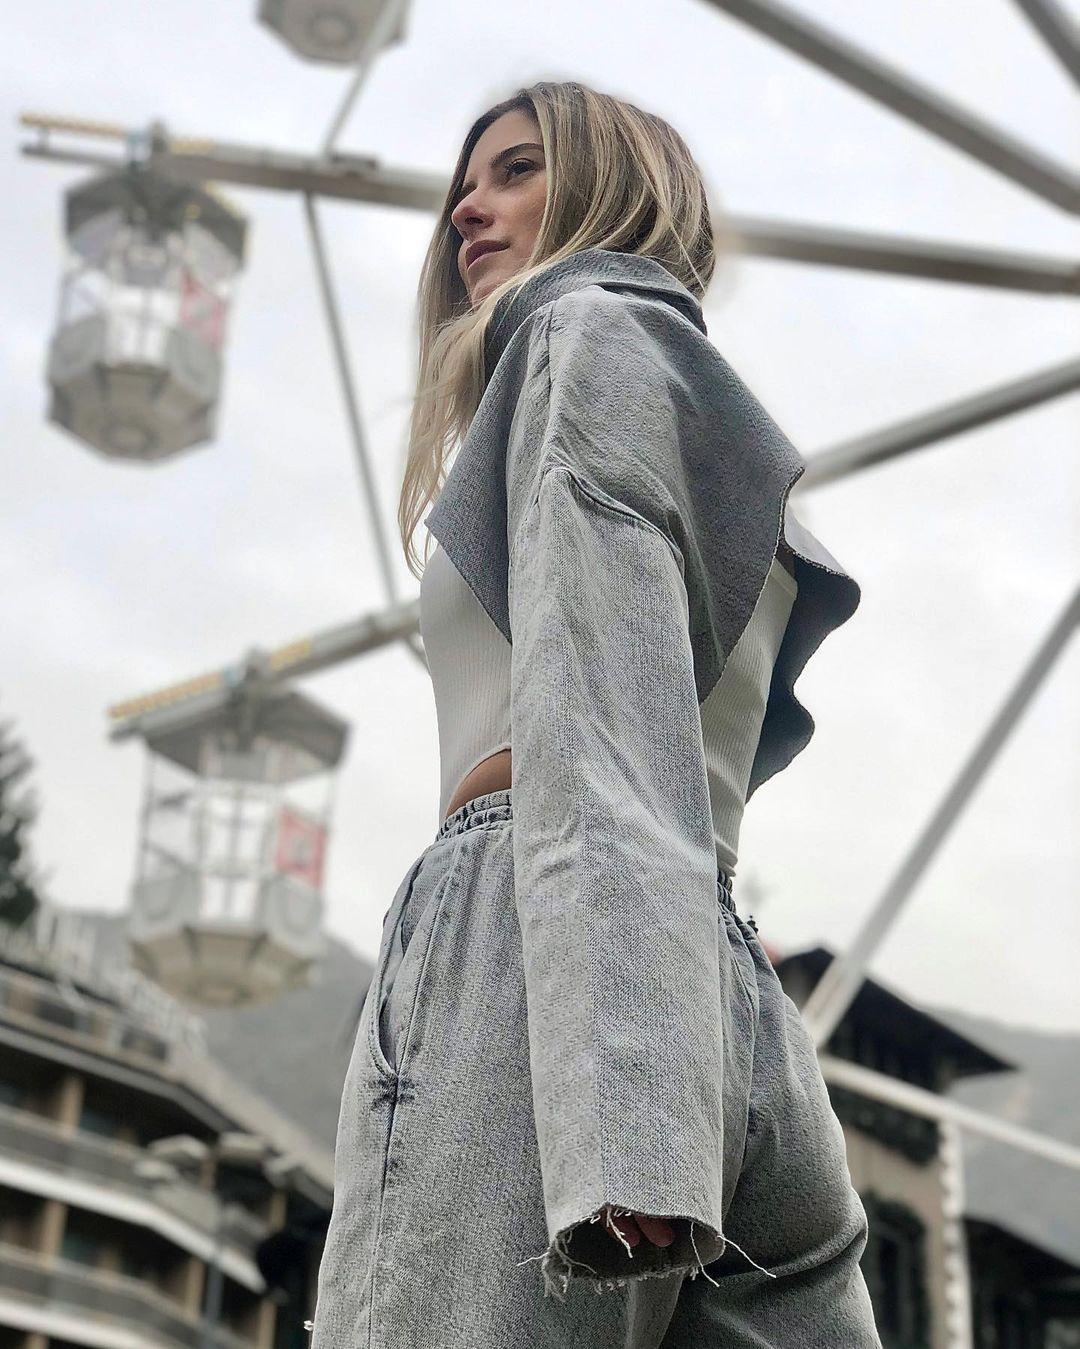 Gemma-Gallardo-Wallpapers-Insta-Fit-Bio-2